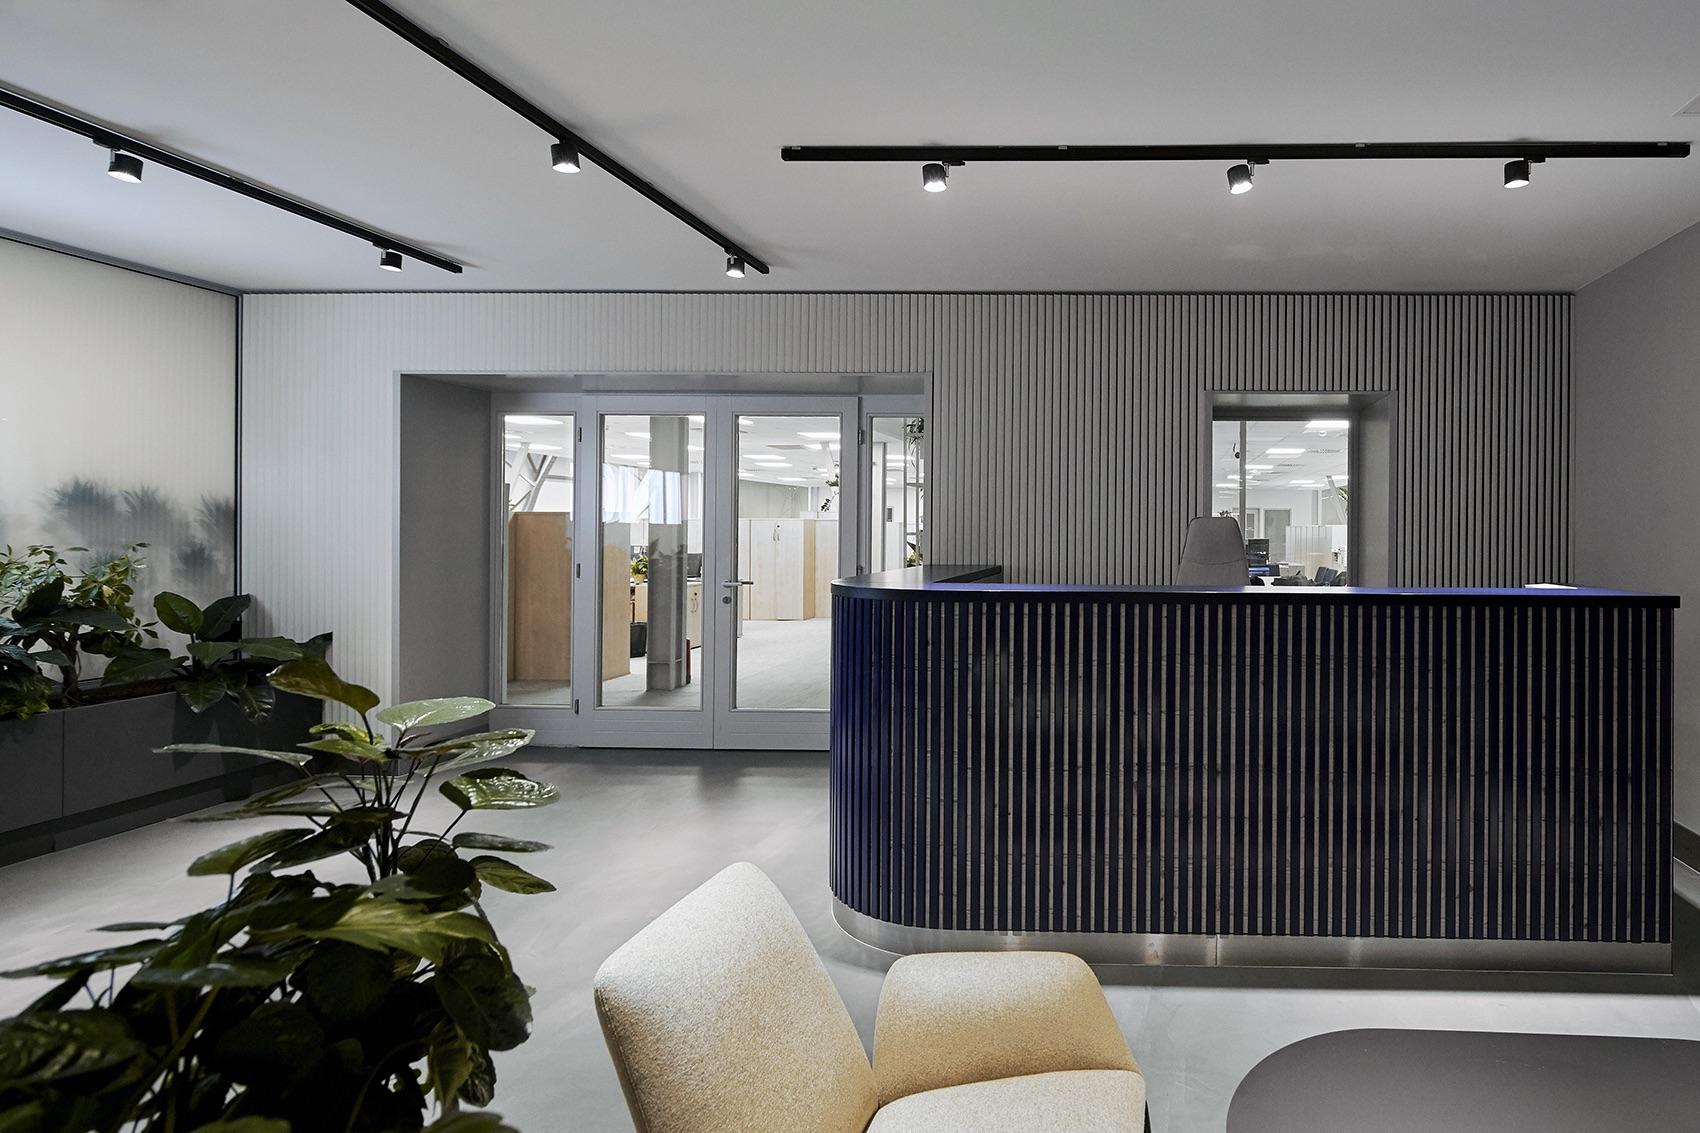 wing-zrt-office-3